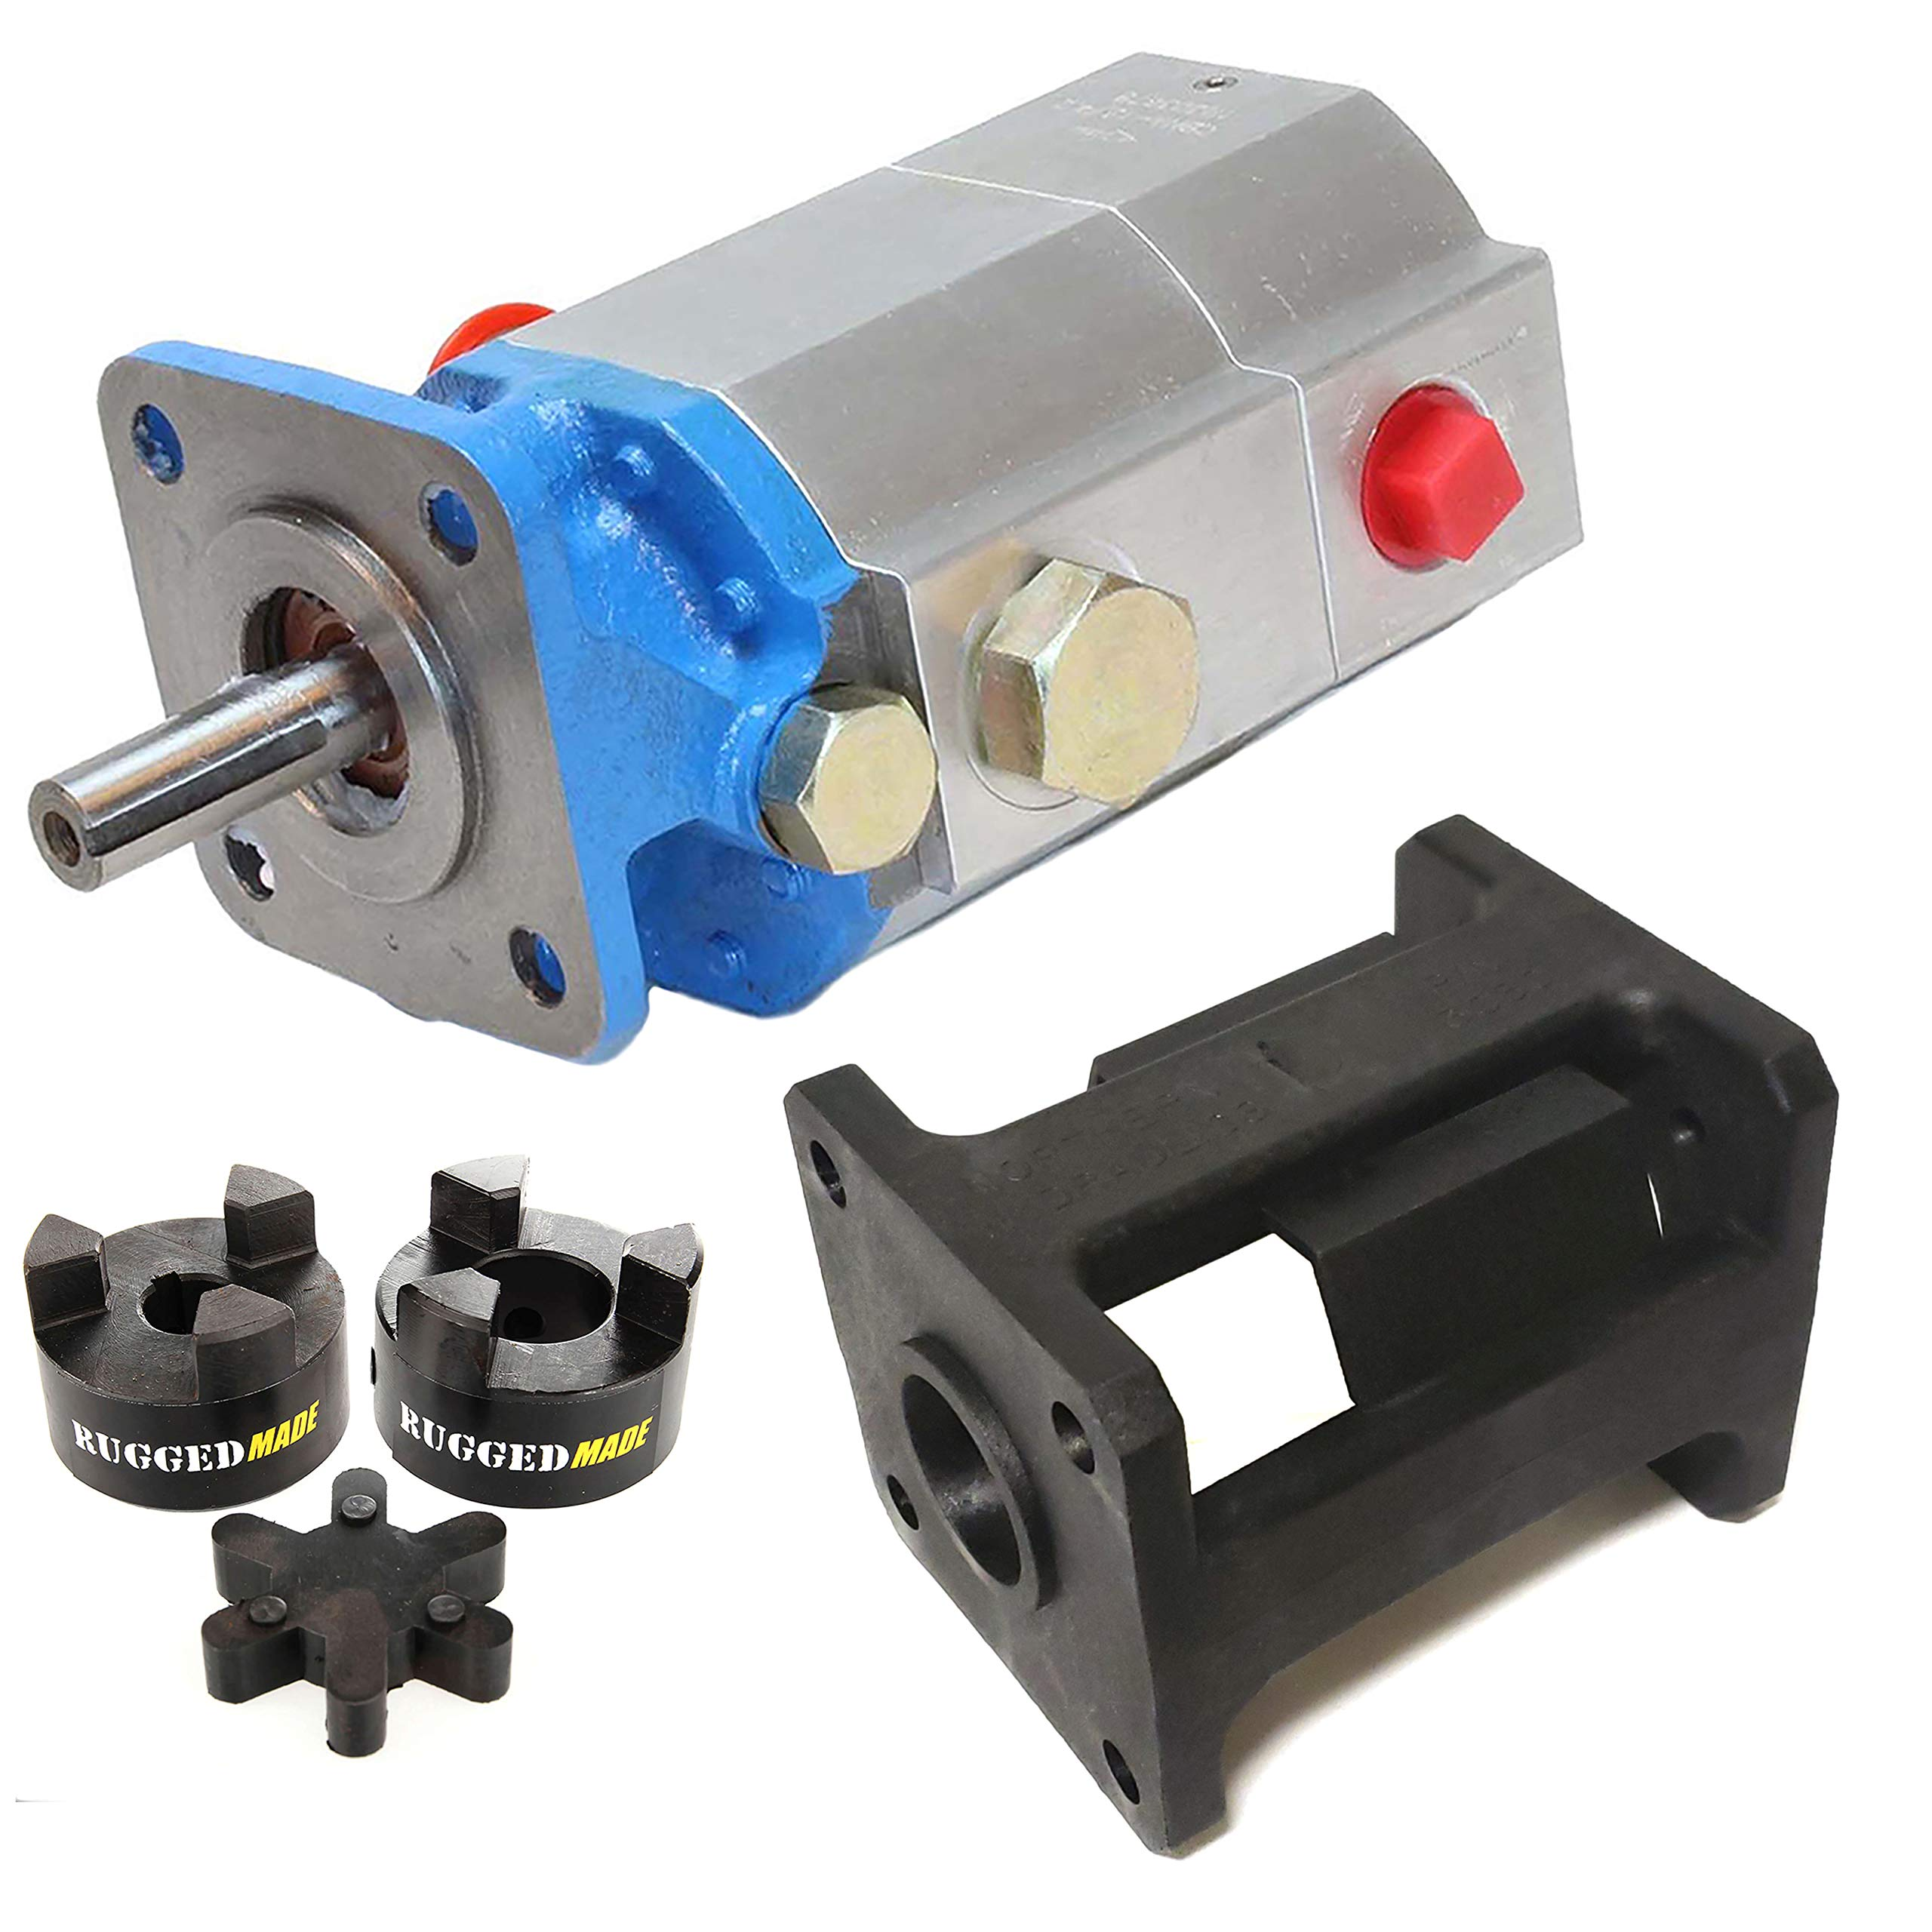 RuggedMade Hydraulic Log Splitter Build Kit - 11 GPM Pump, Small Engine Mounting Bracket, Coupler for 5/8'' Engine Shaft